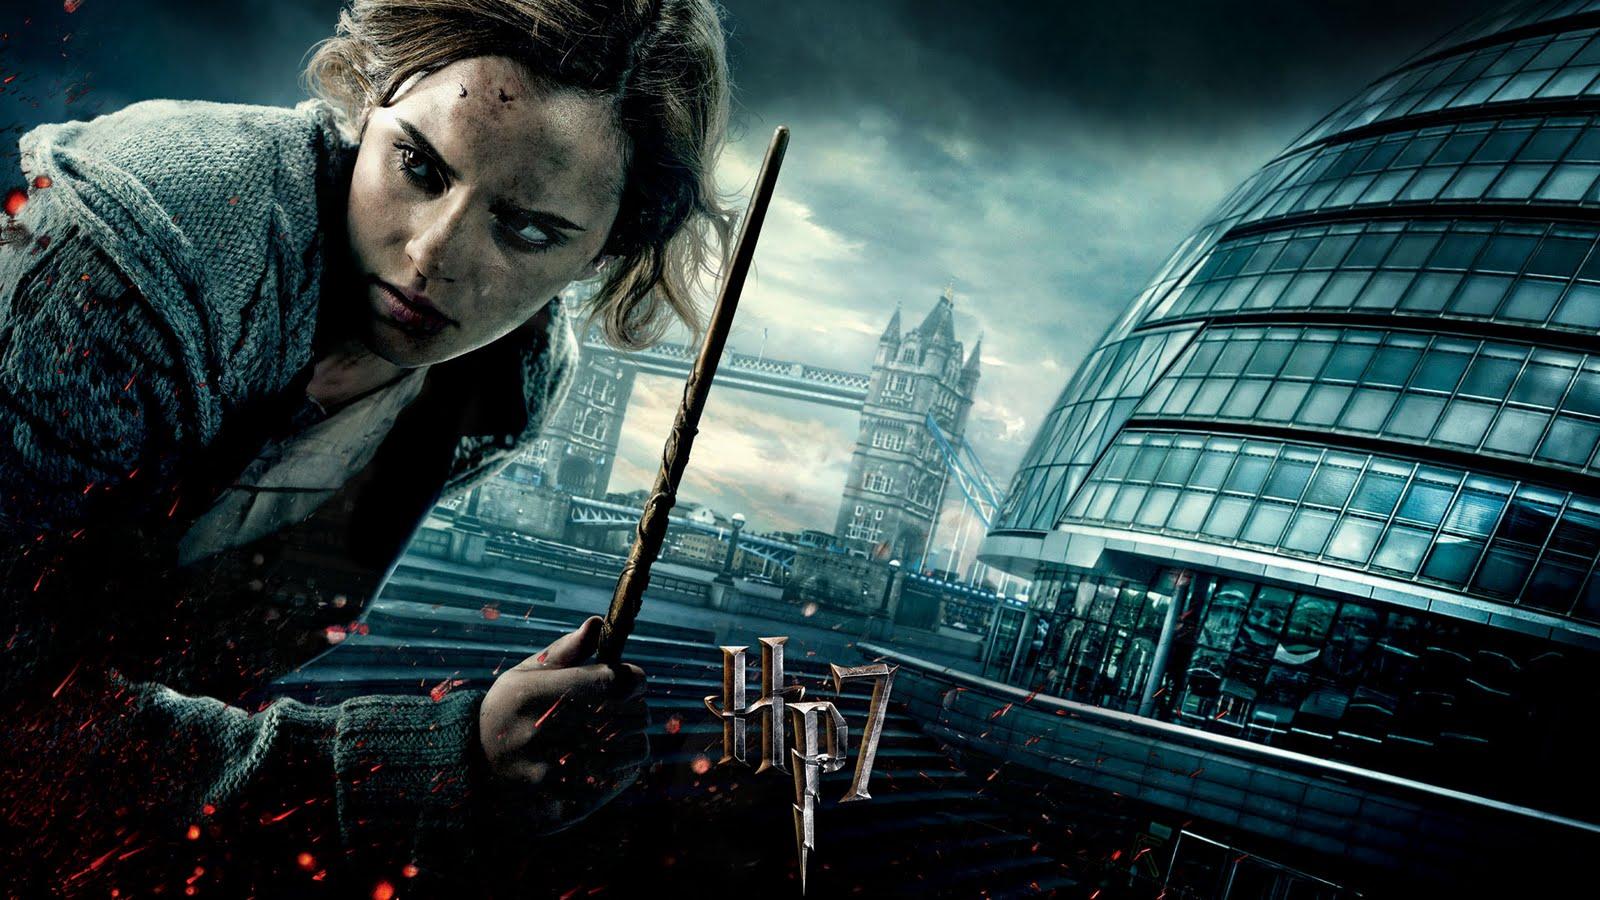 Harry Potter 7 part 2 eng